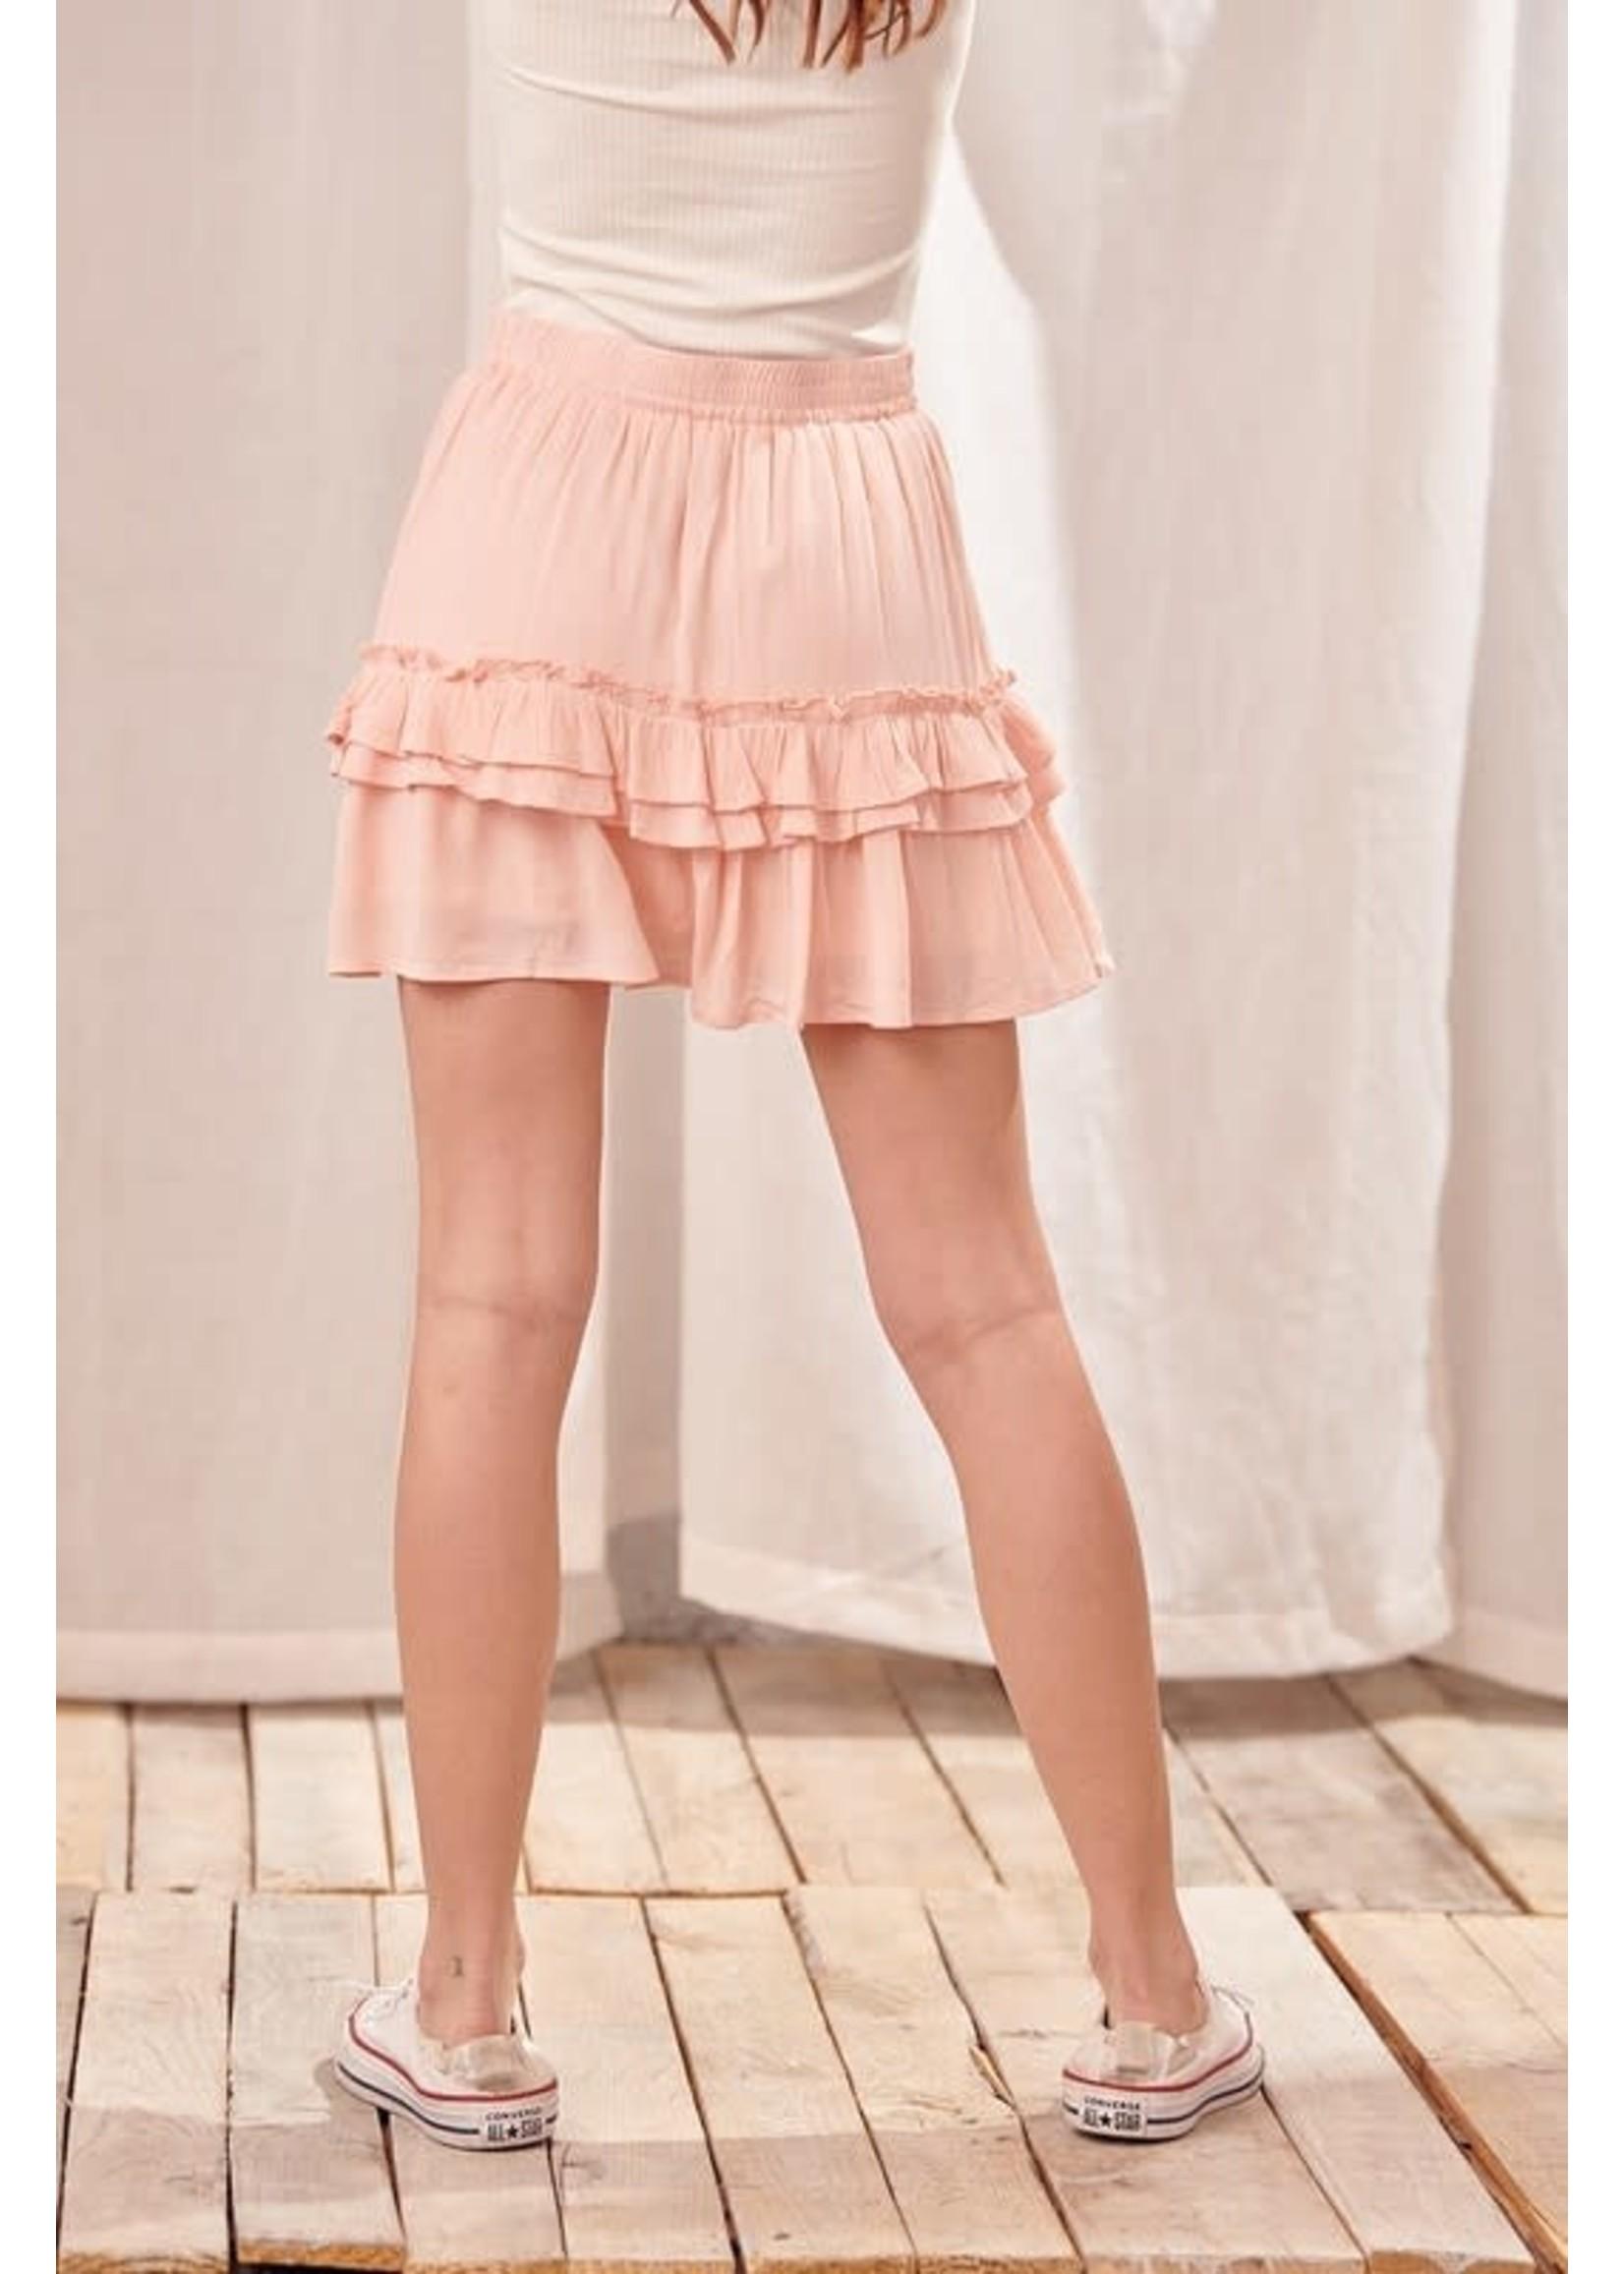 Storia Ruffled and Frilled Mini Skirt - JS2635